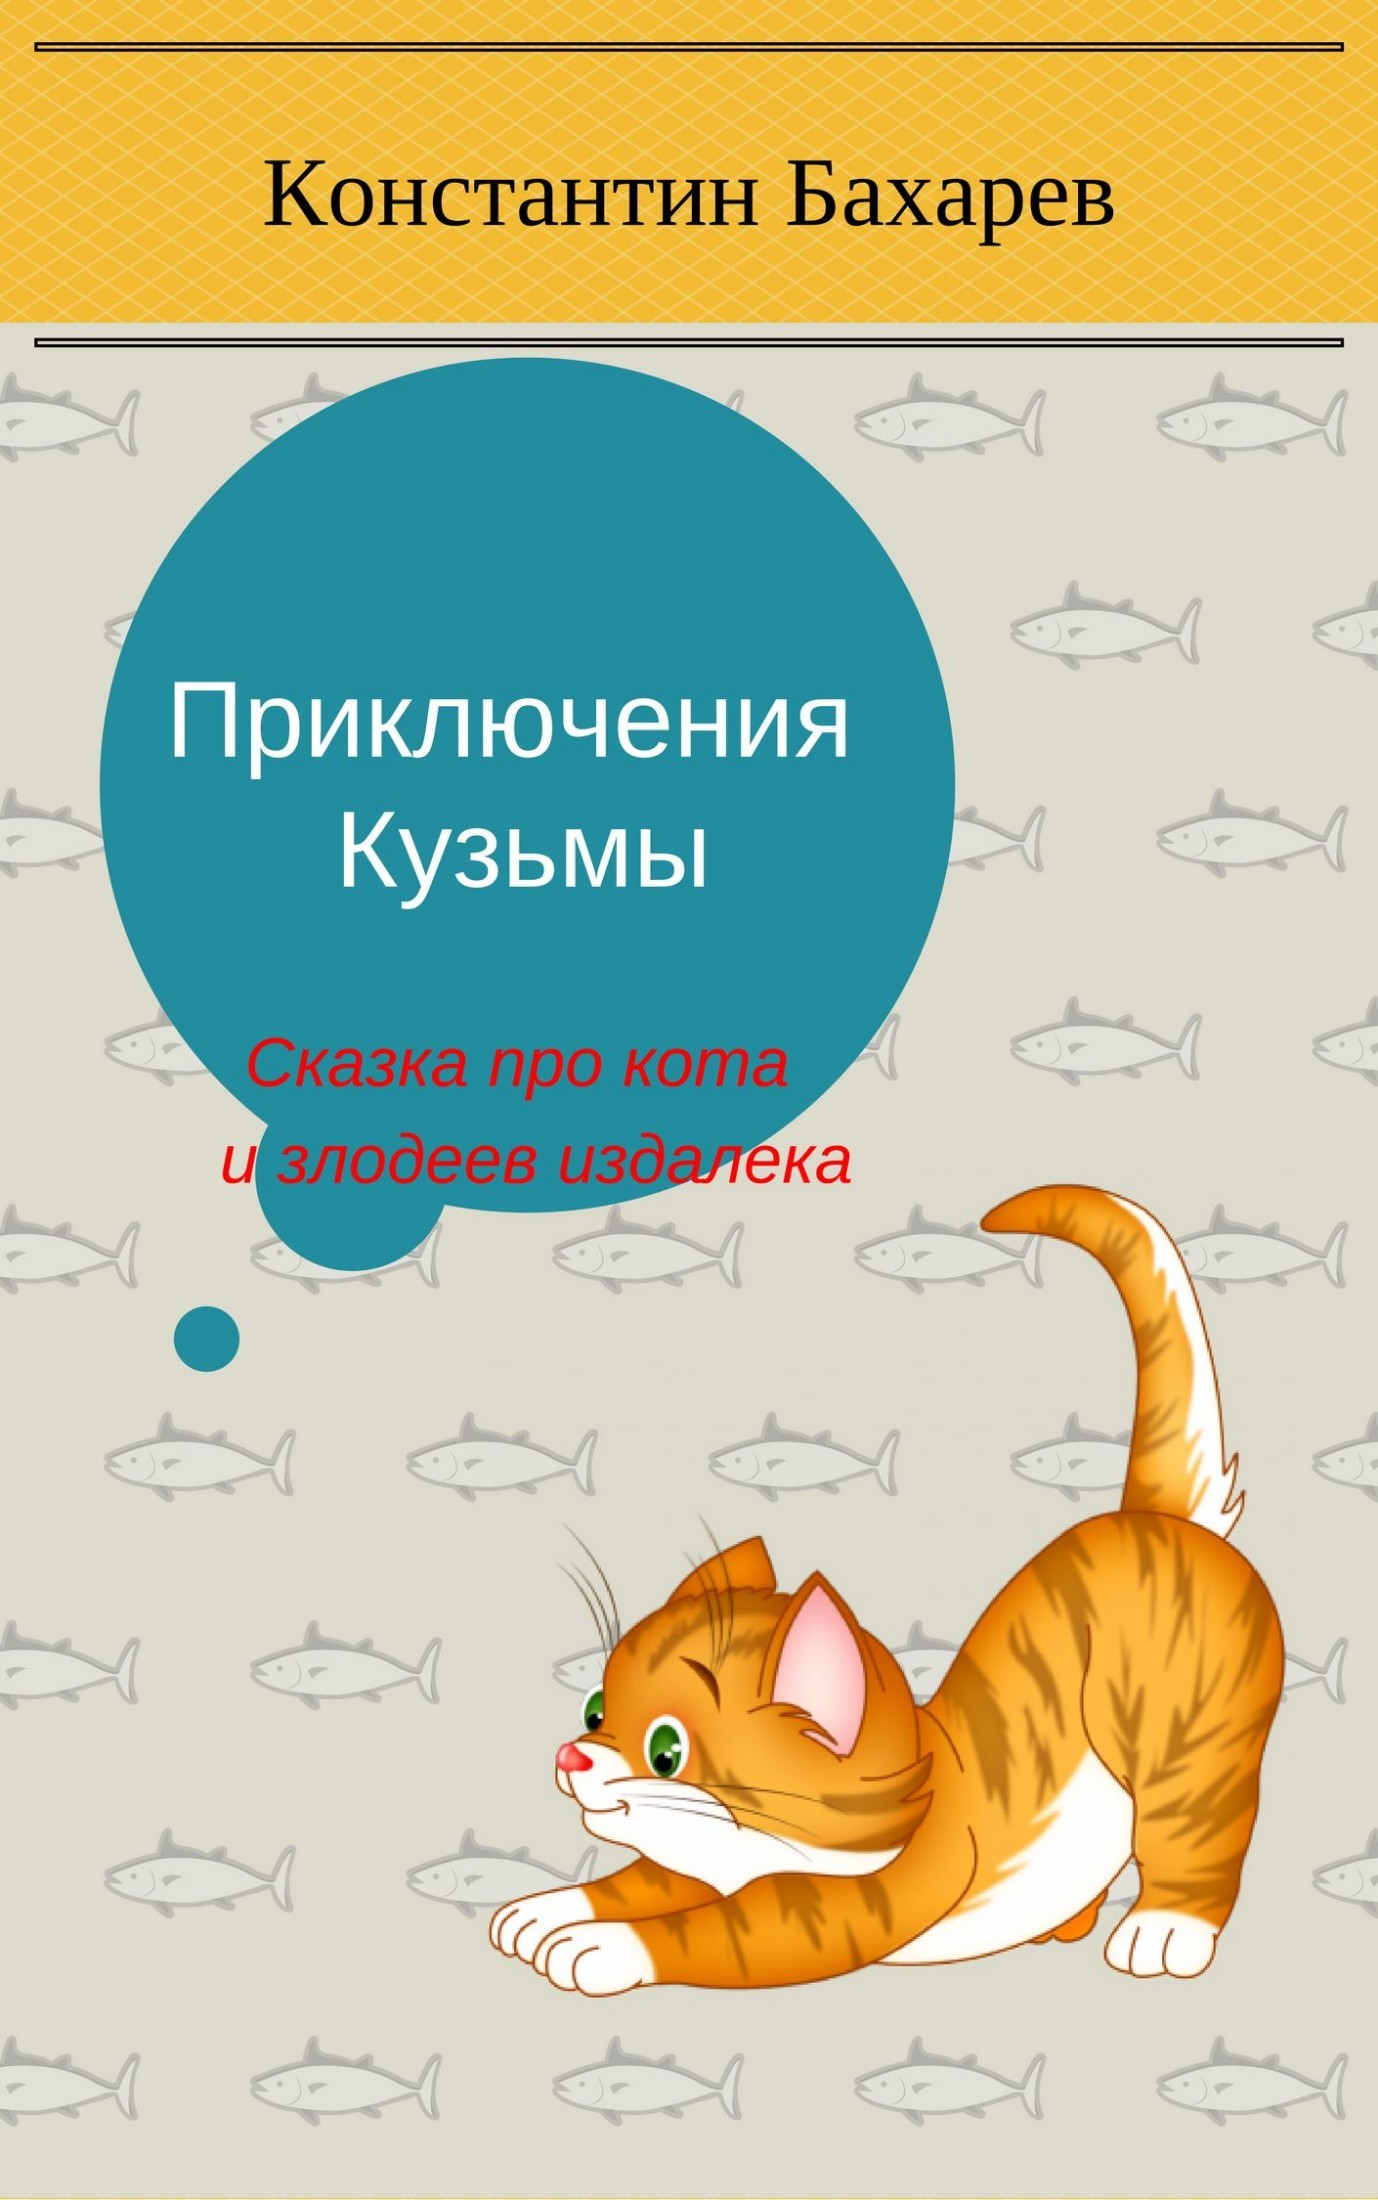 Константин Бахарев - Приключения Кузьмы